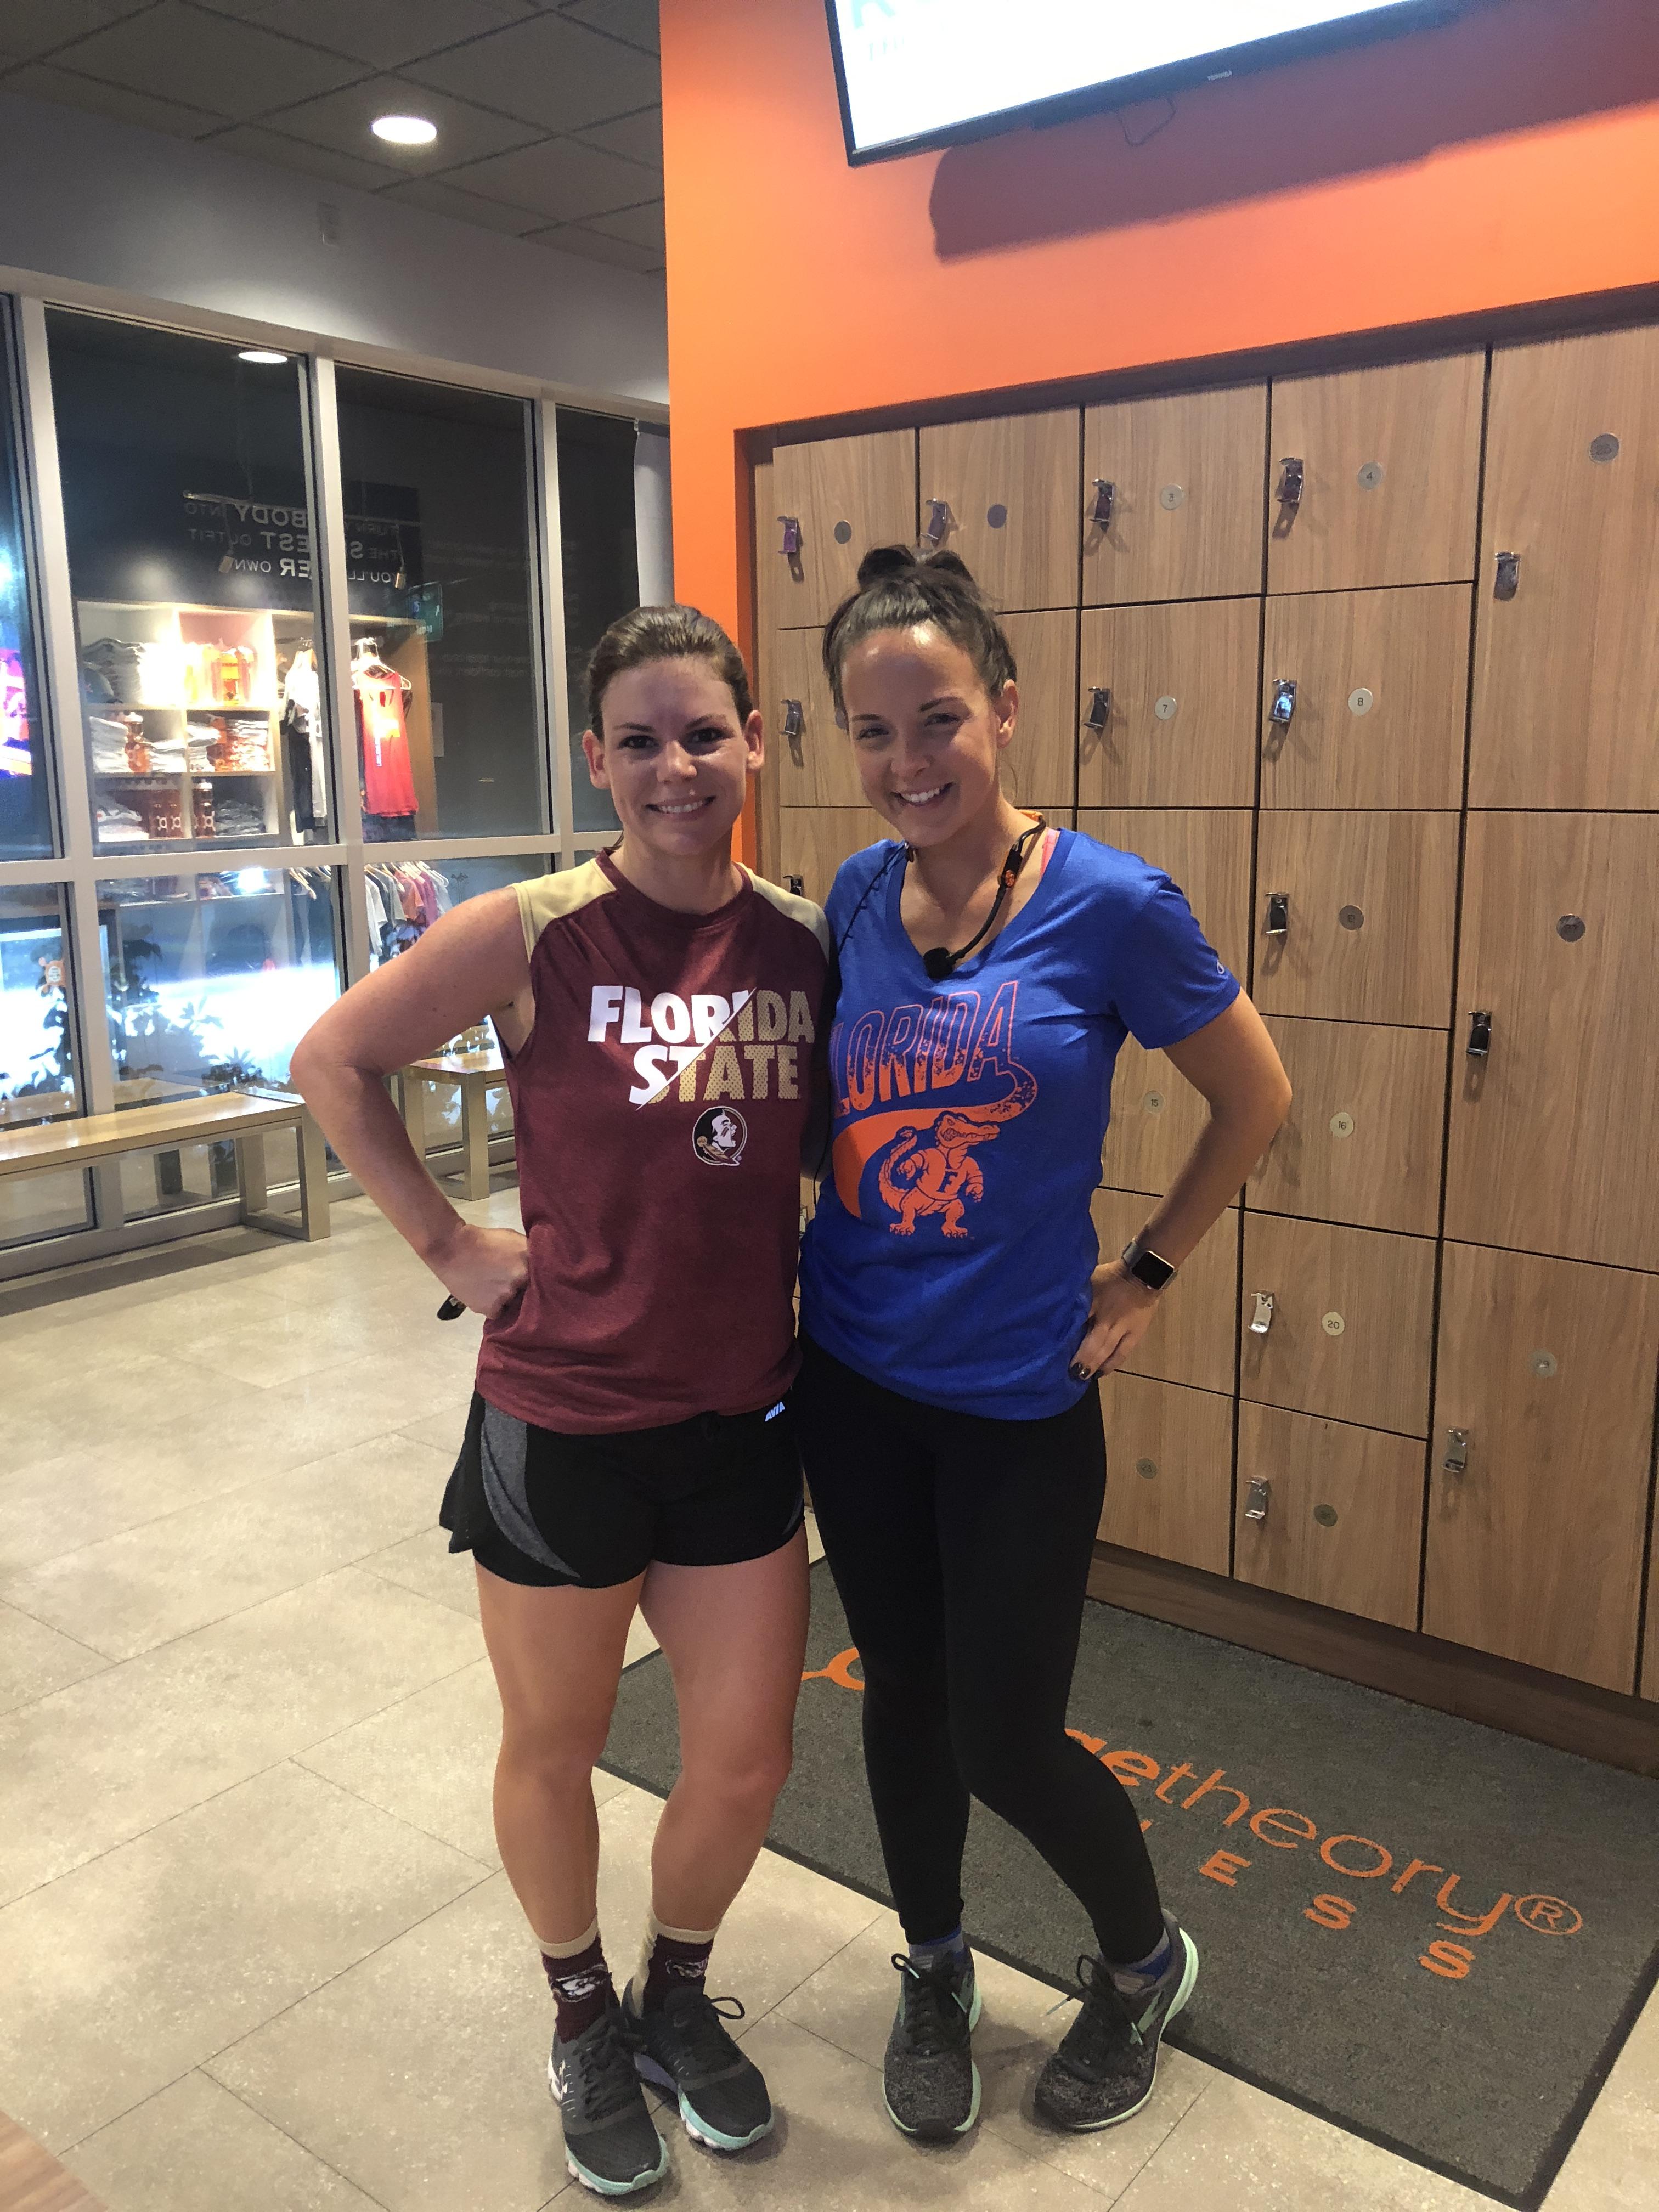 orangetheory fitness review – Erica in the locker room